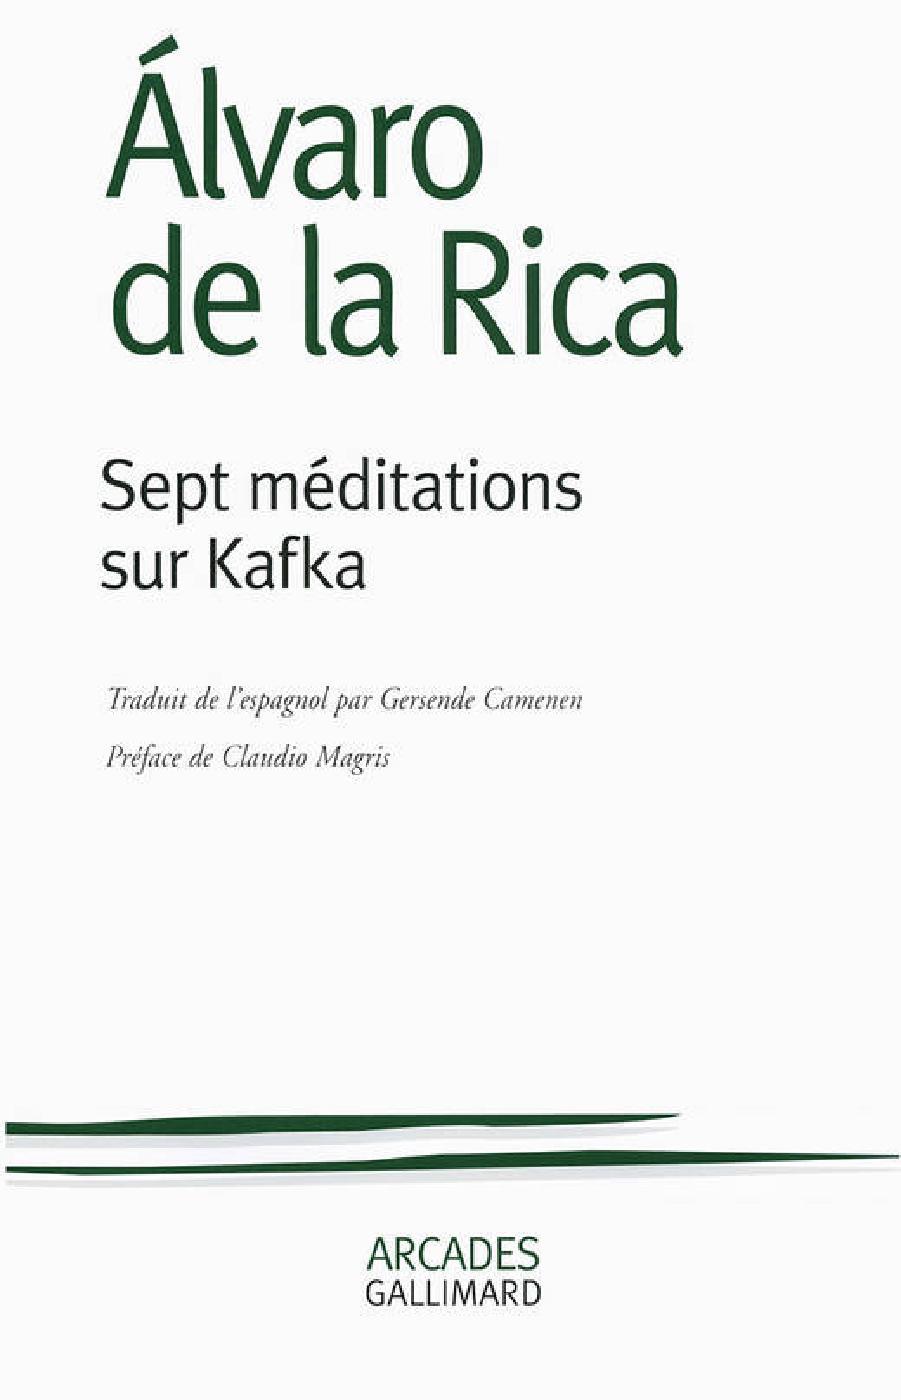 sept-meditations sur Kafka (Gallimard, 2014)